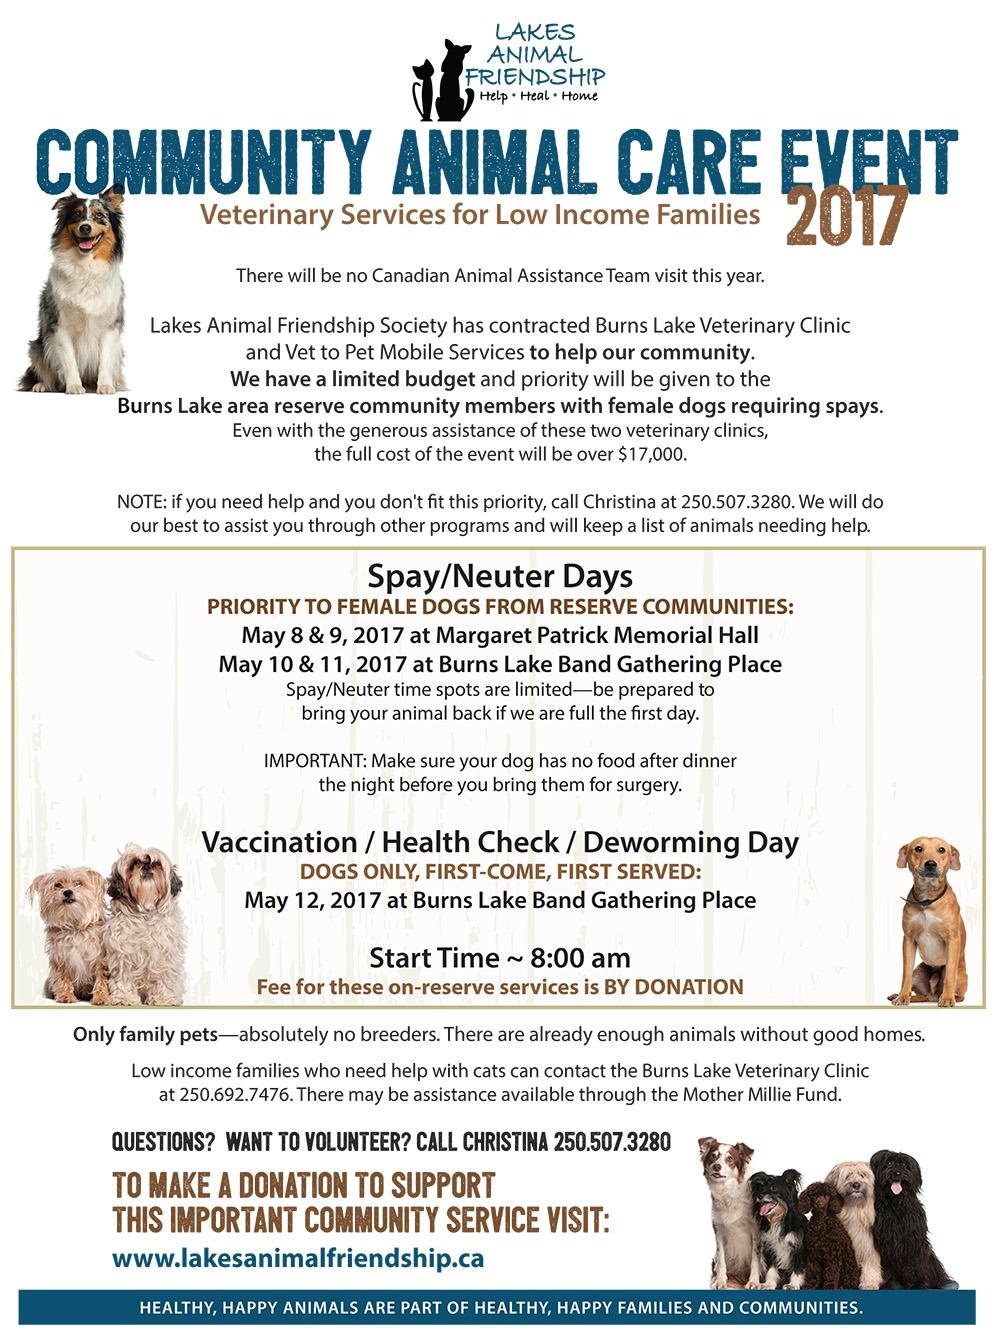 Community Animal Care 2017